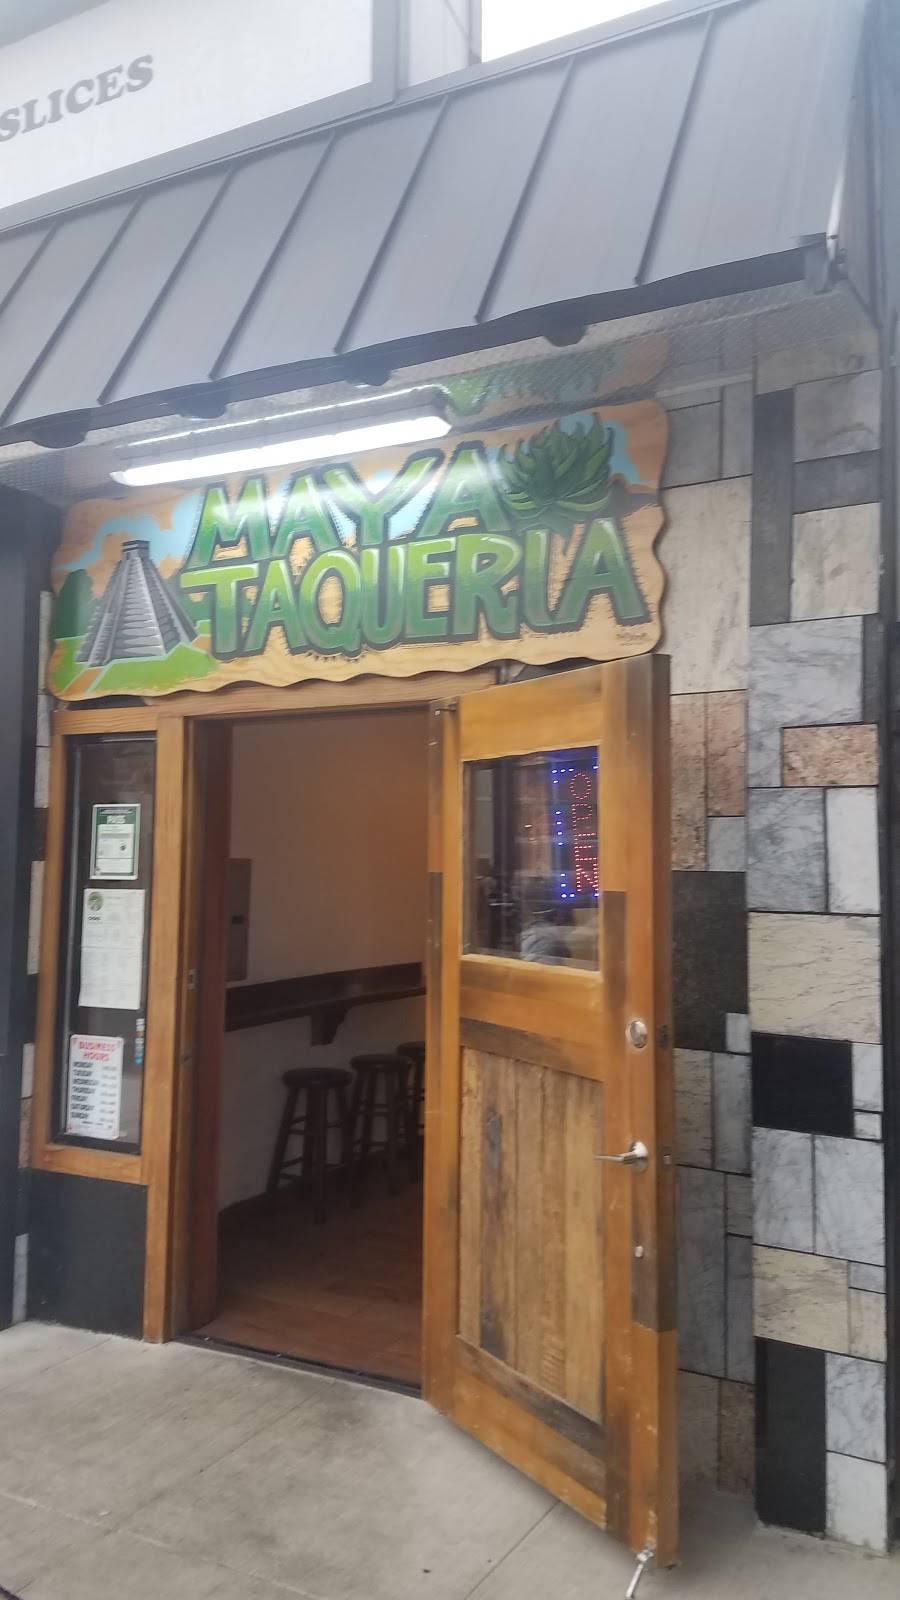 Maya Taqueria | restaurant | 130 Railroad Ave, Richmond, CA 94801, USA | 5103746594 OR +1 510-374-6594